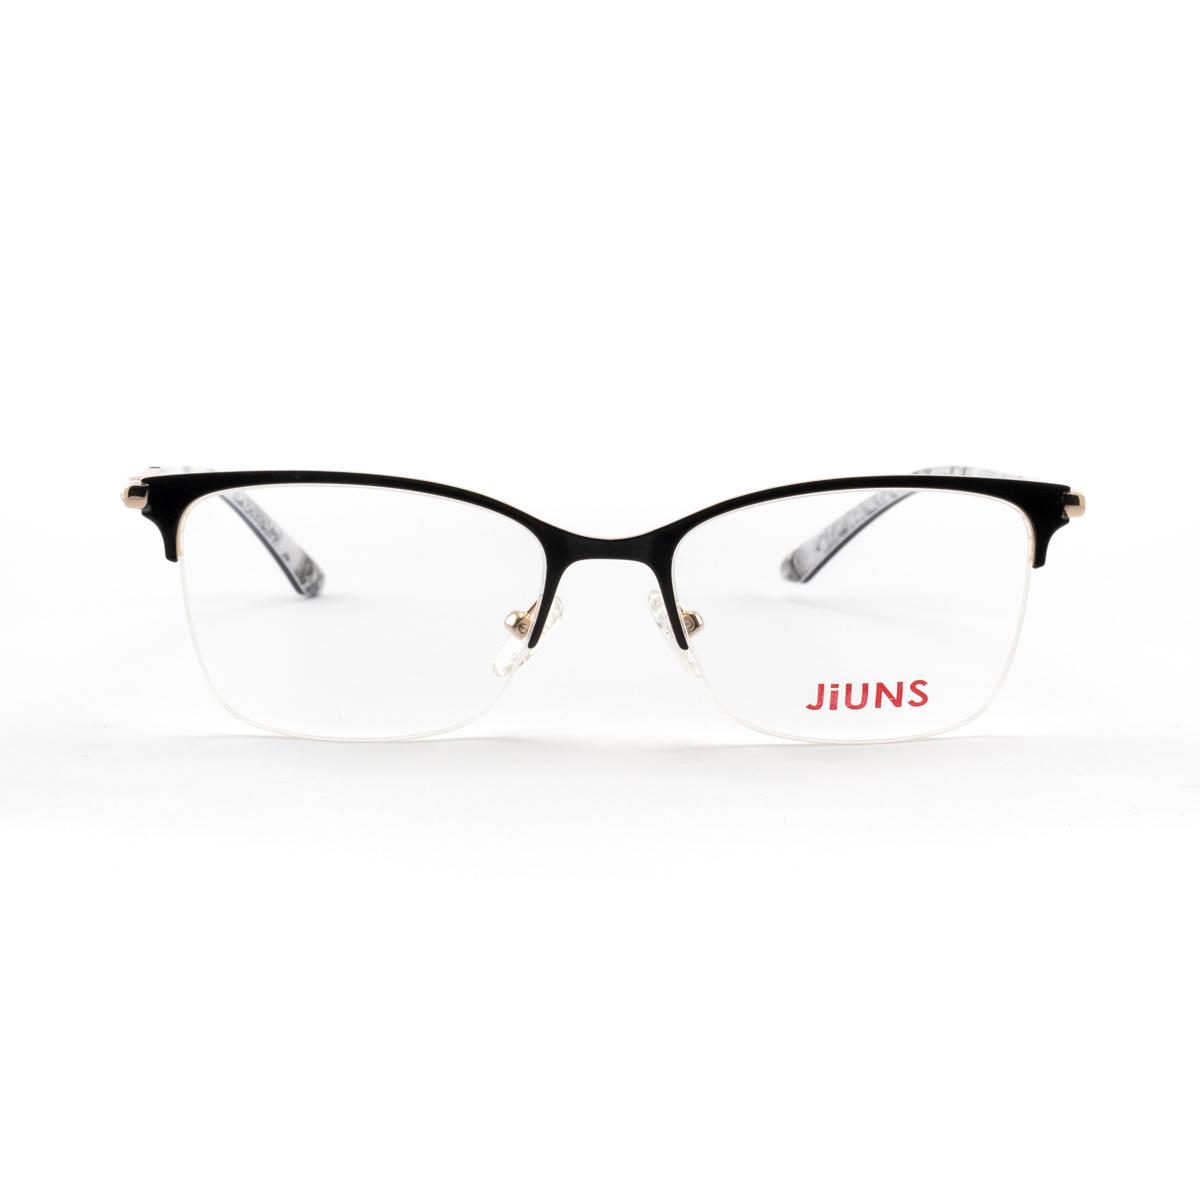 JiUNS MJ4346